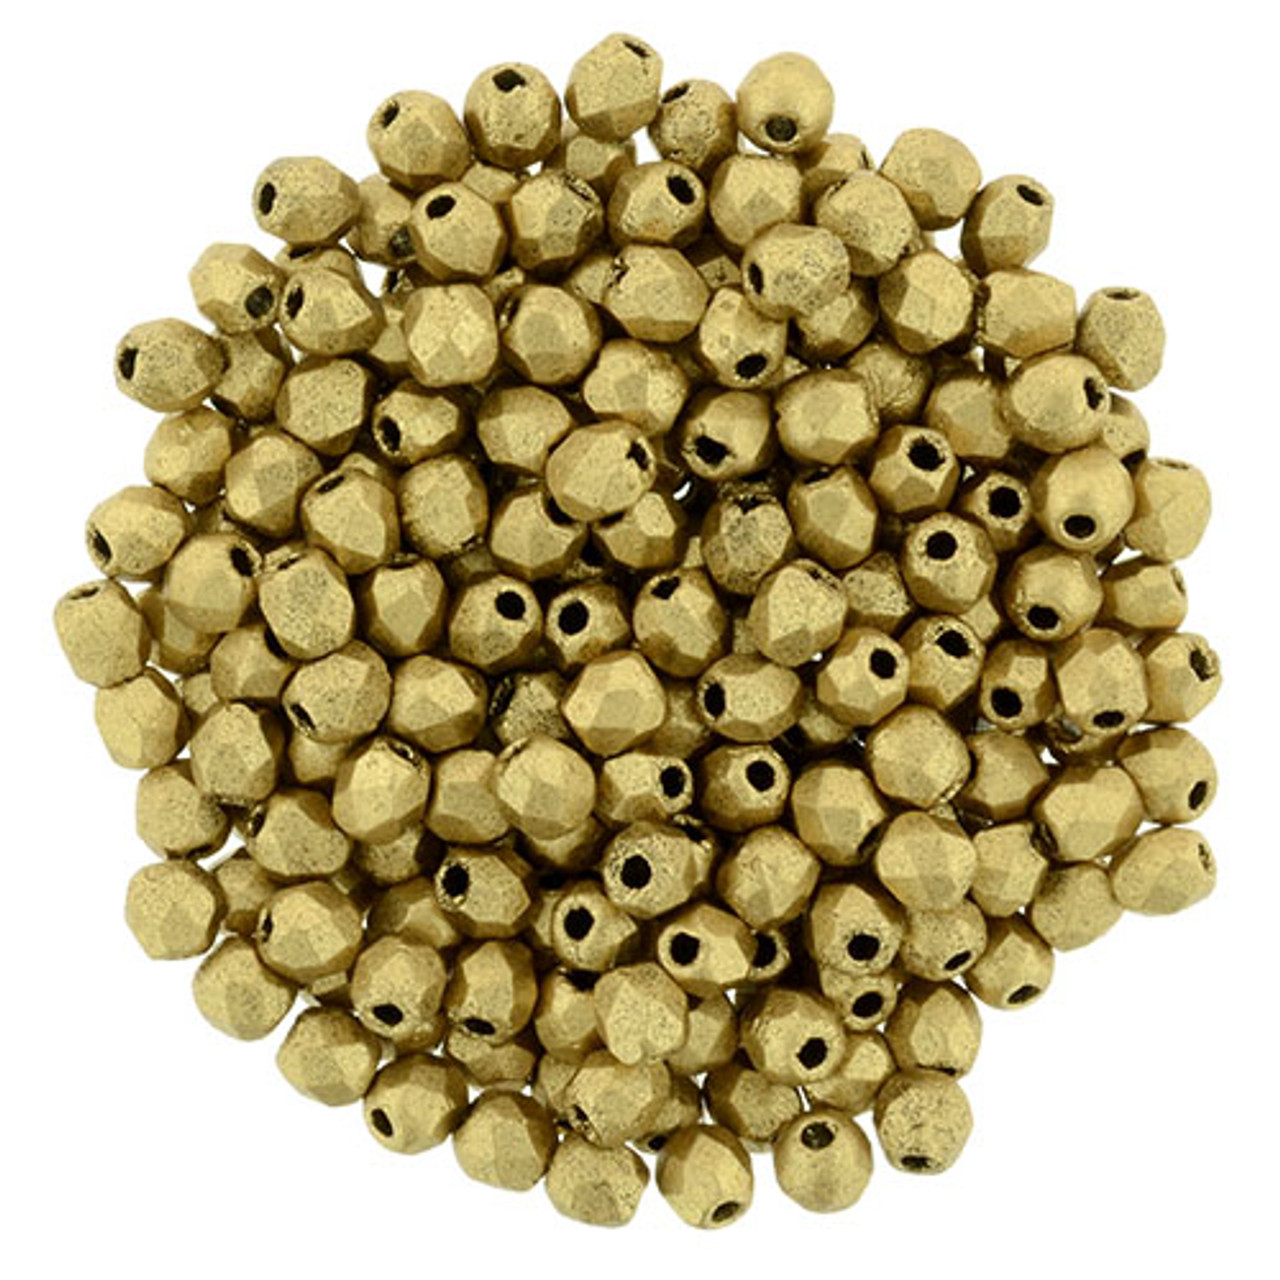 2mm Metallic Flax Fire Polish Beads - 50pk